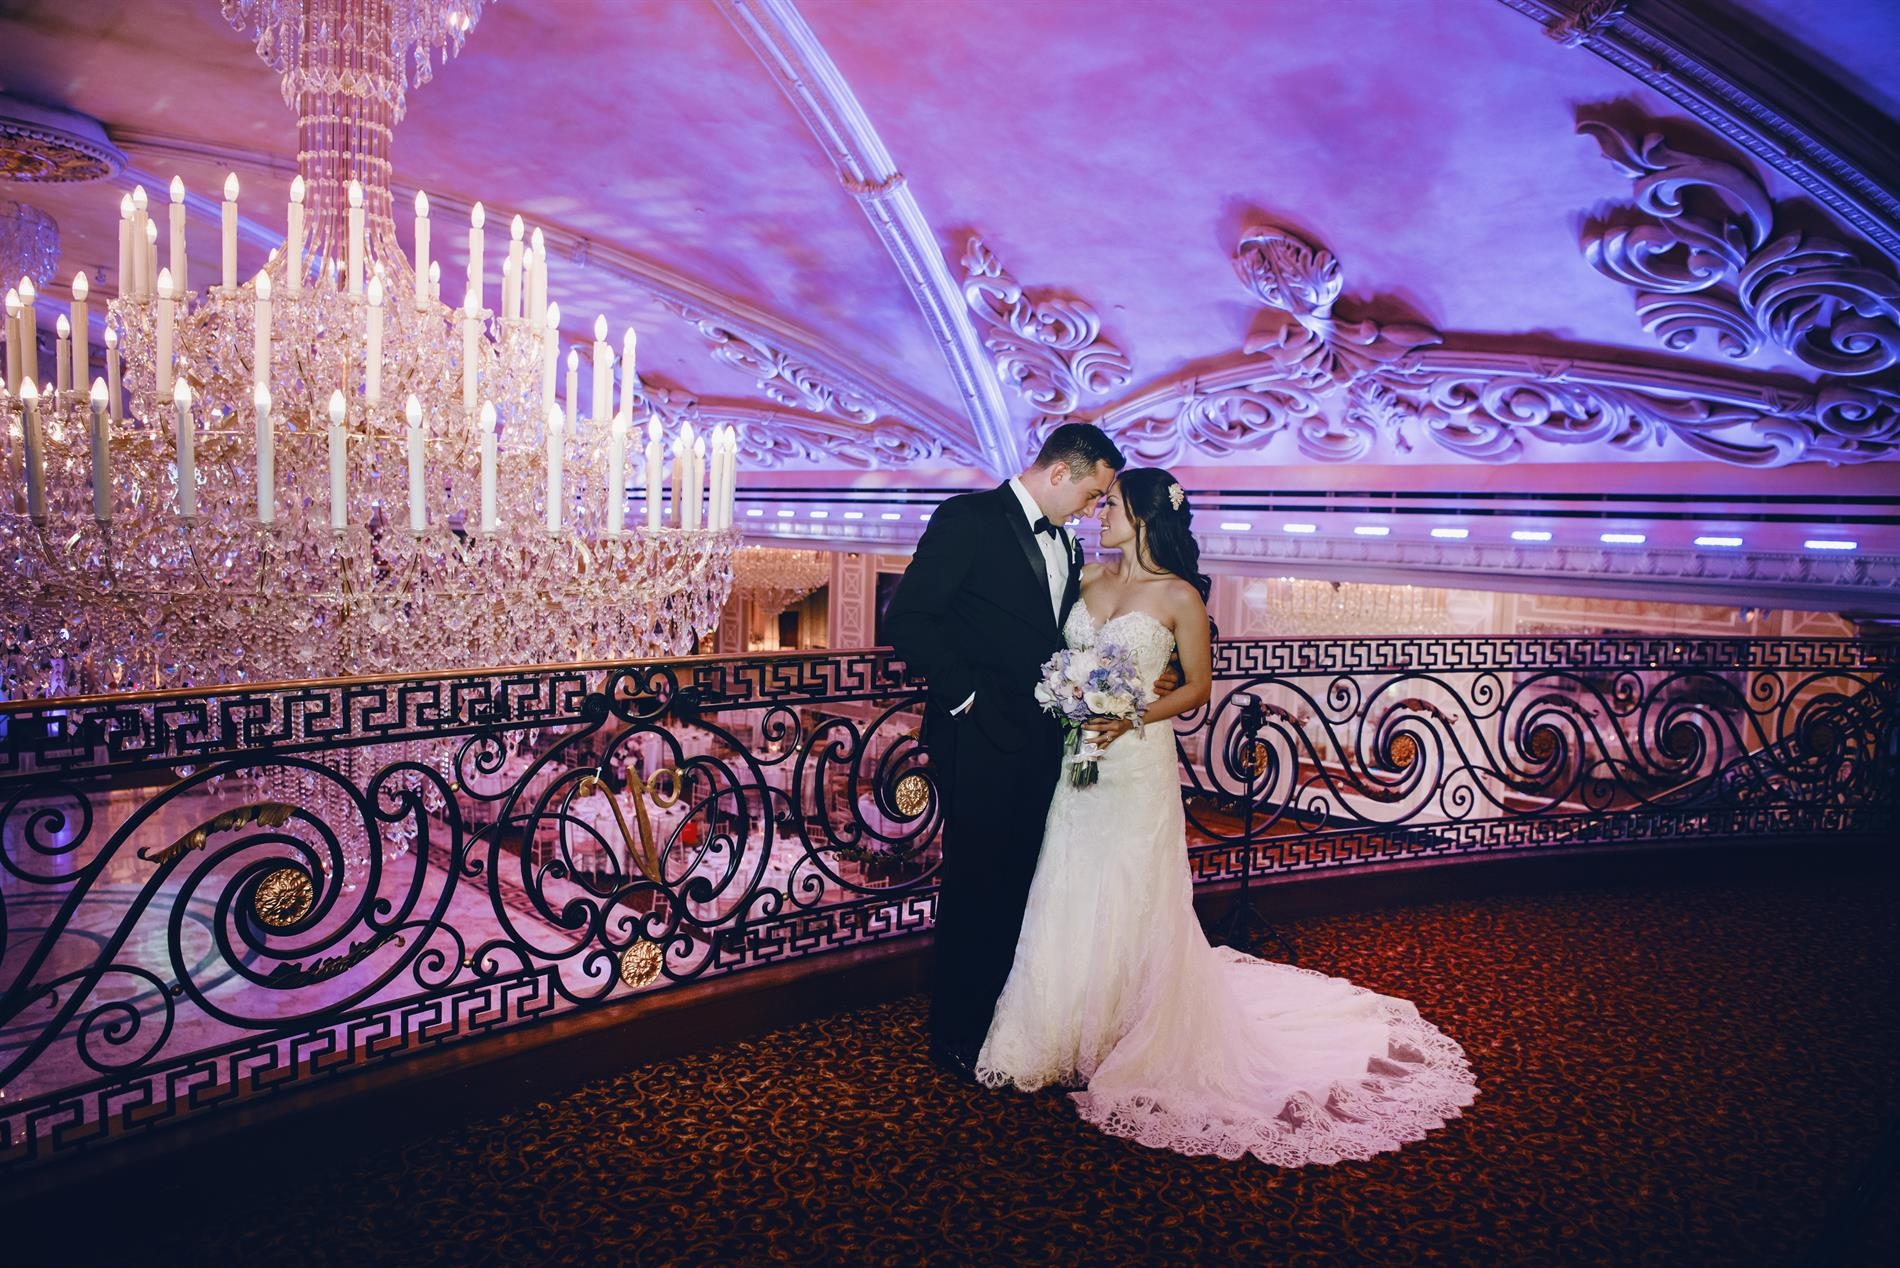 Matthew and Kelly Wedding Photos